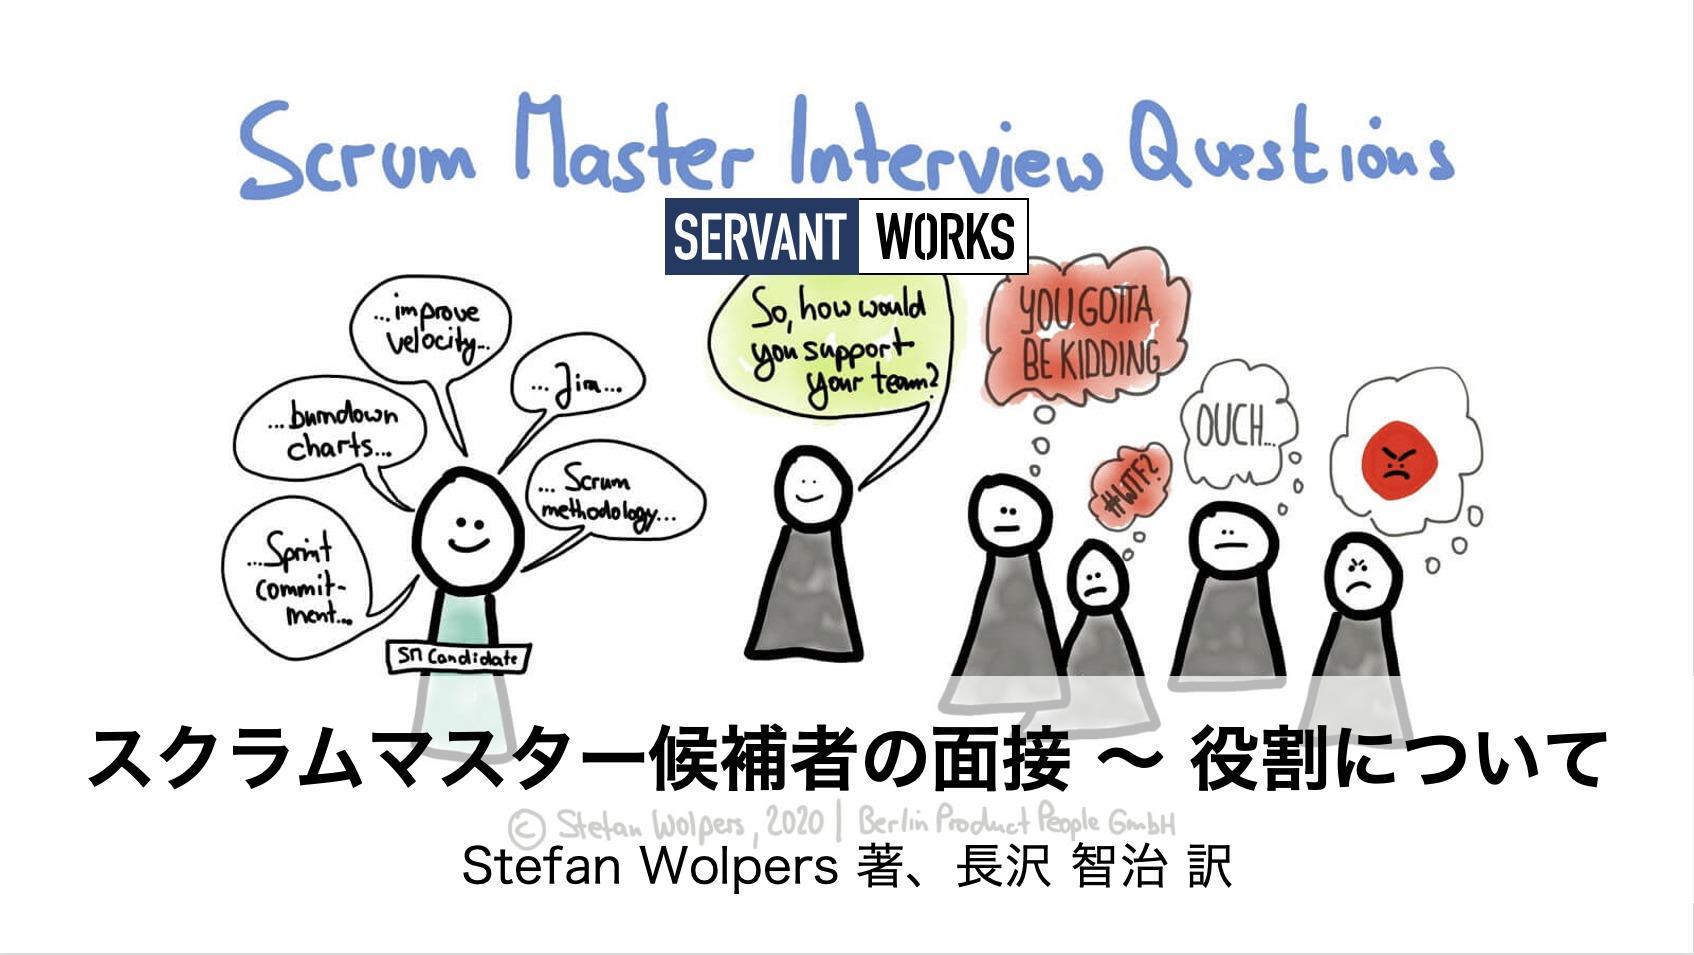 scrum-master-interview-questions-1-scrum-master-role